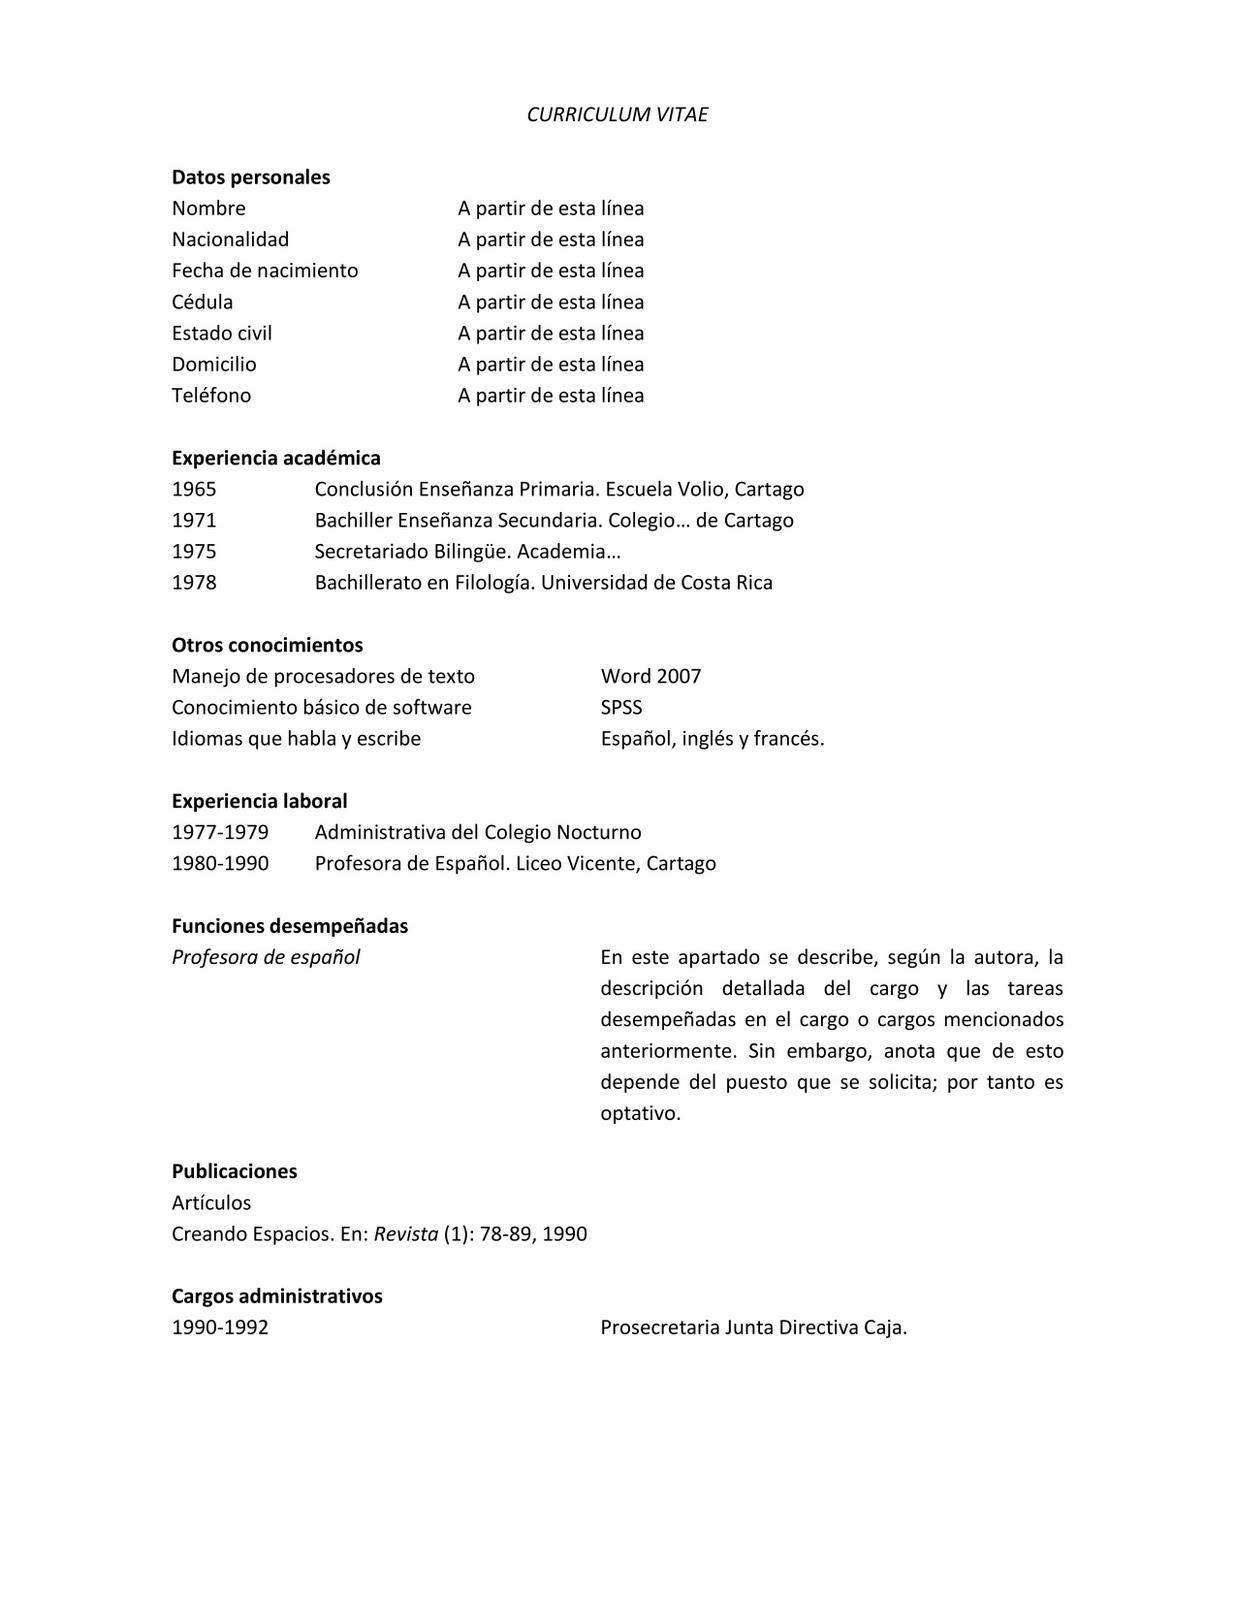 Curriculum Vitae Ingeniero Electronica Nuevos Ejemplos De